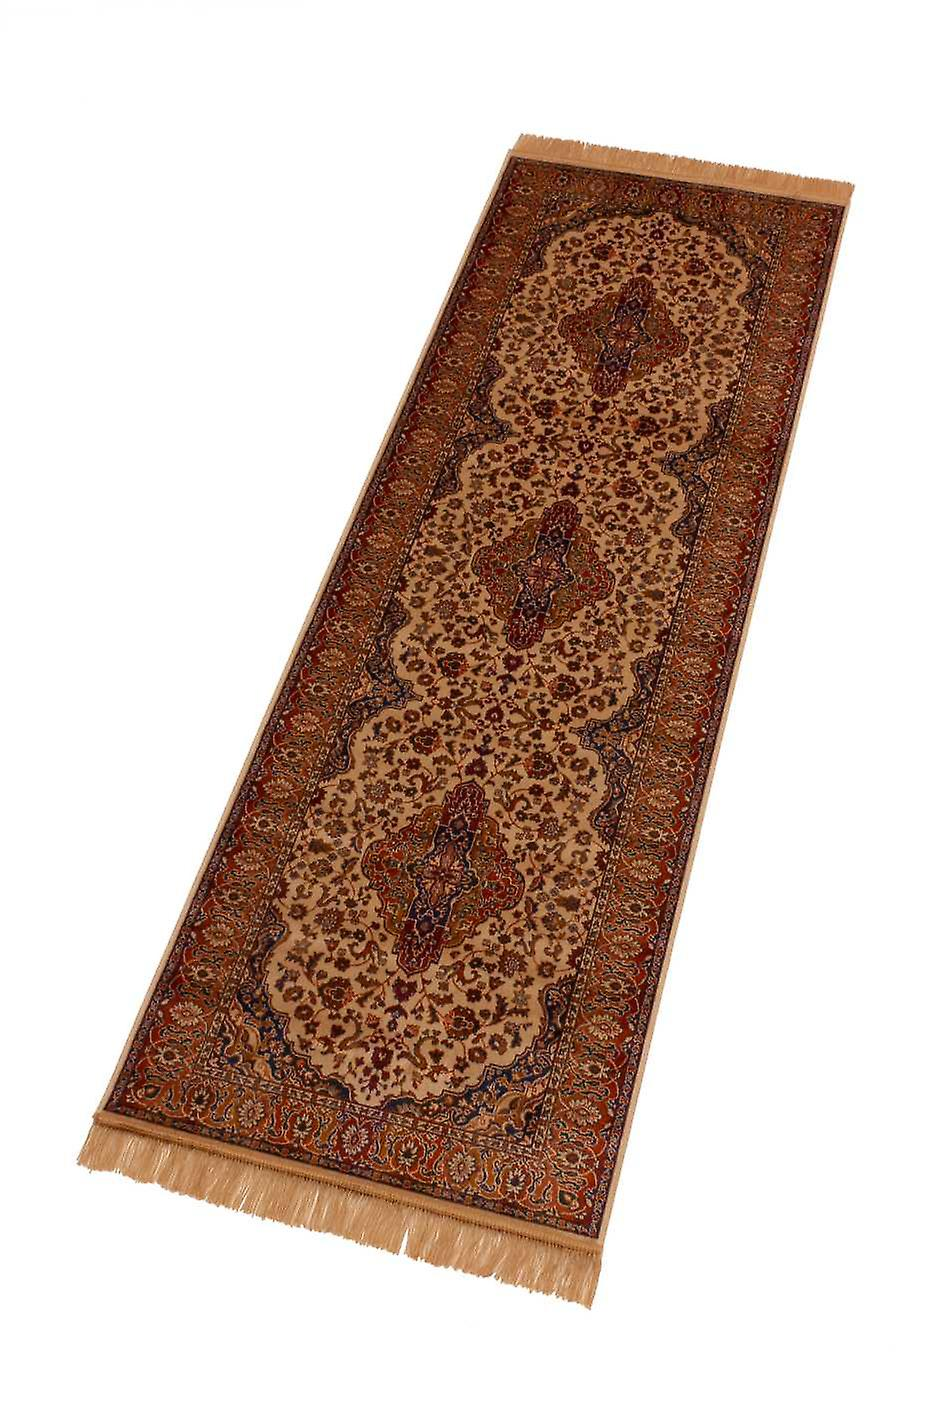 Persian Medallion Artsilk Faux Silk Effect Hall Runner Rugs 9099/4